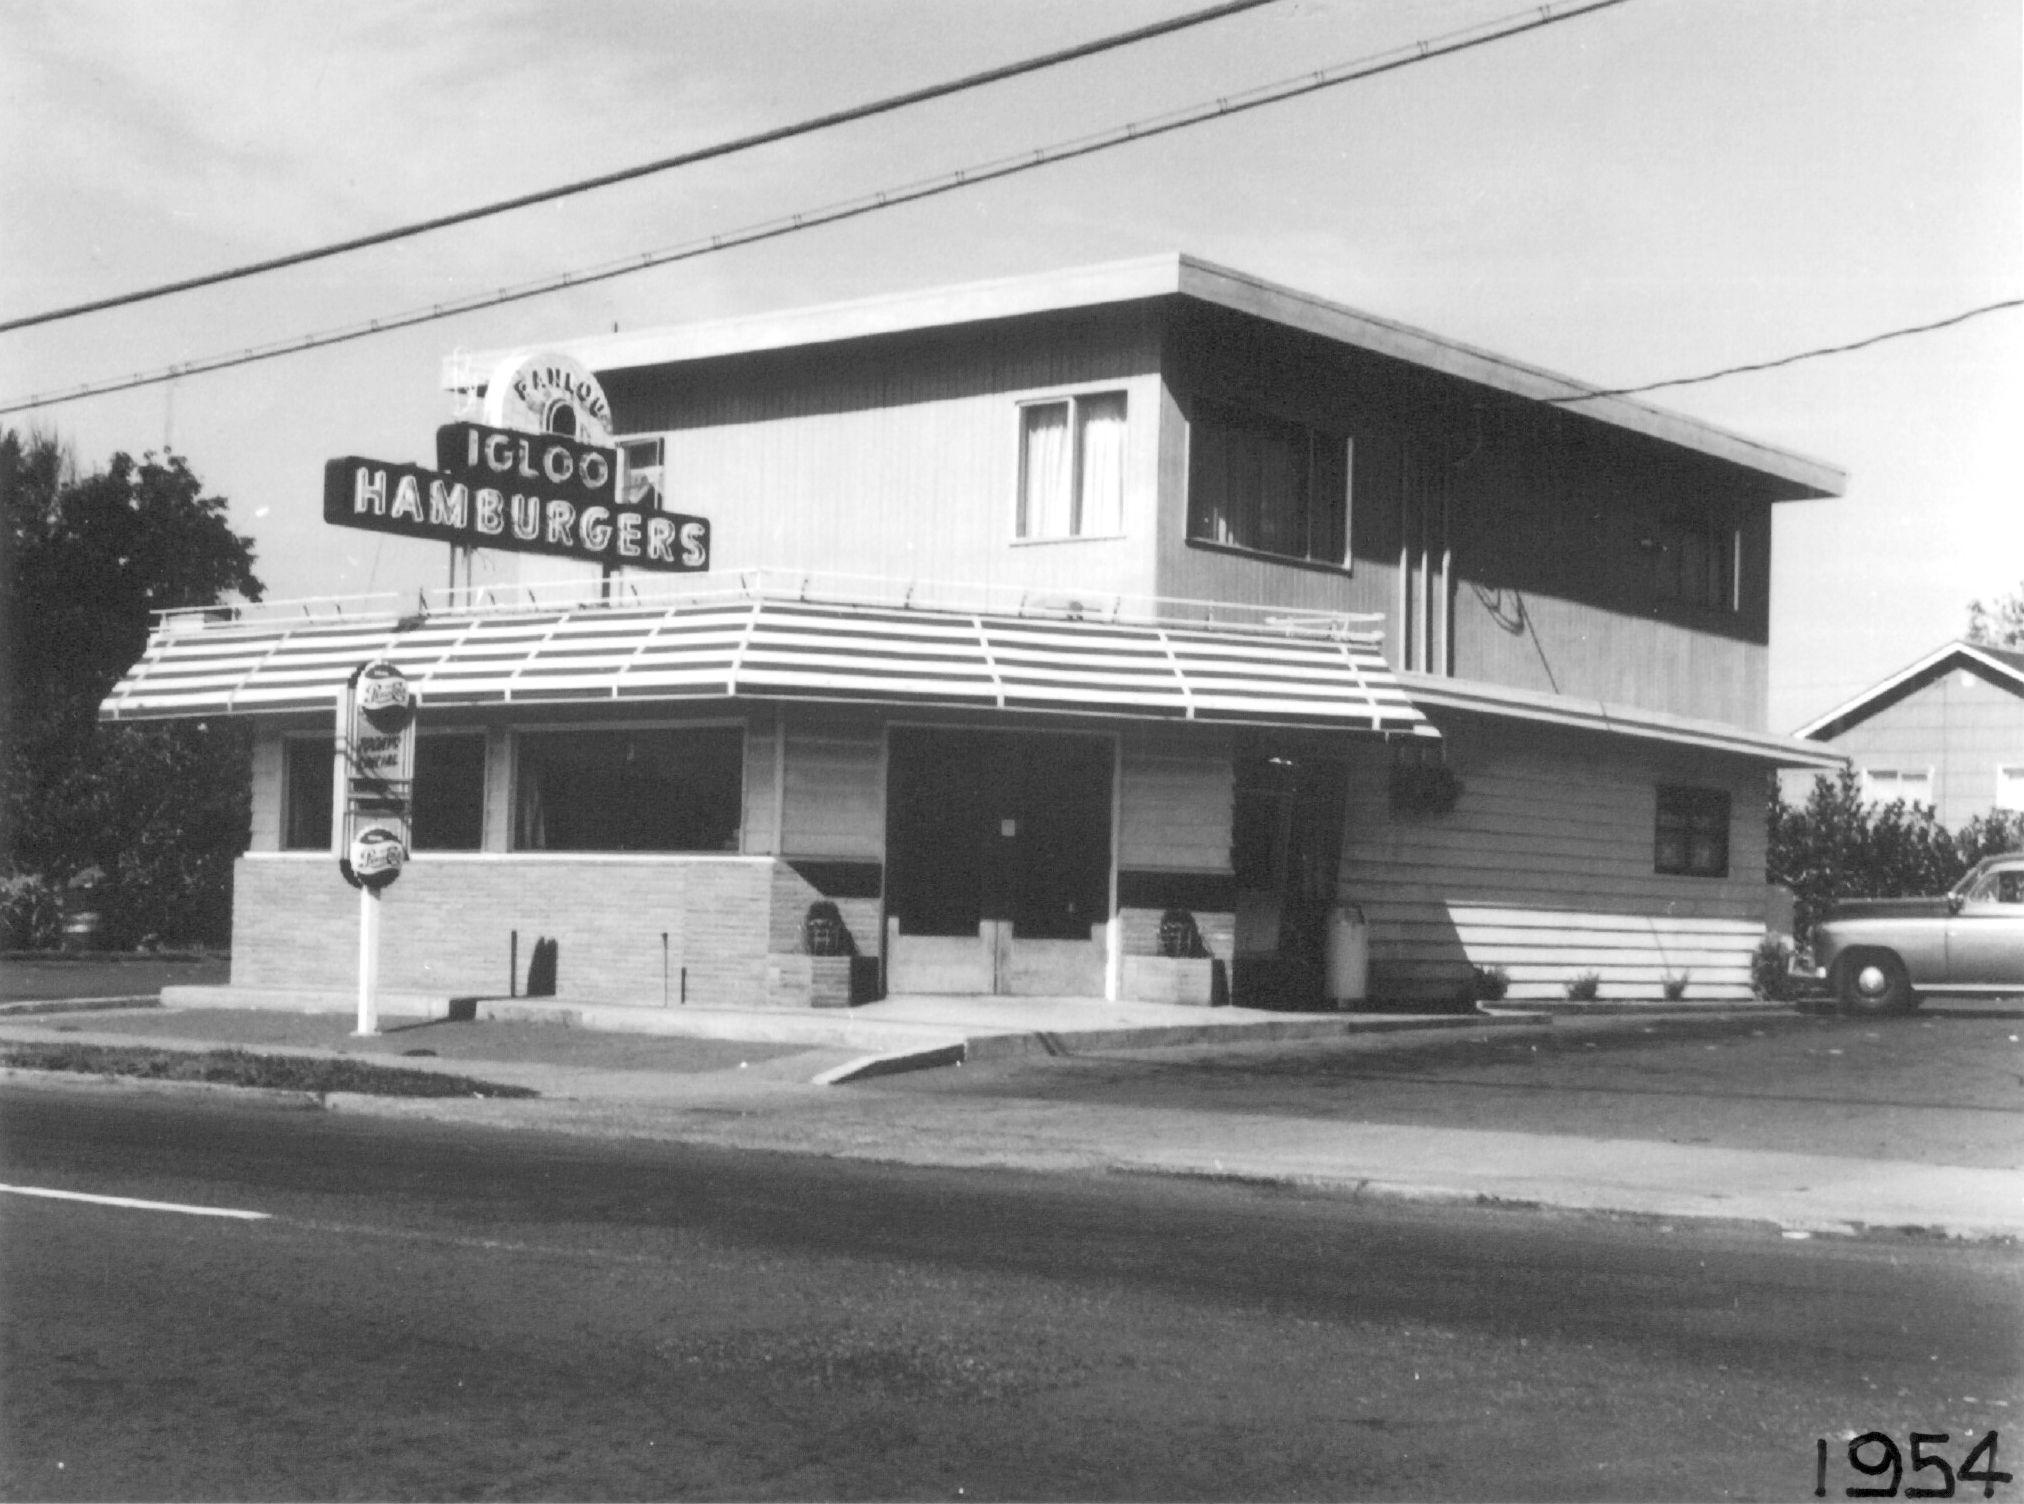 The Igloo Restaurant On East Evergreen Boulevard As It